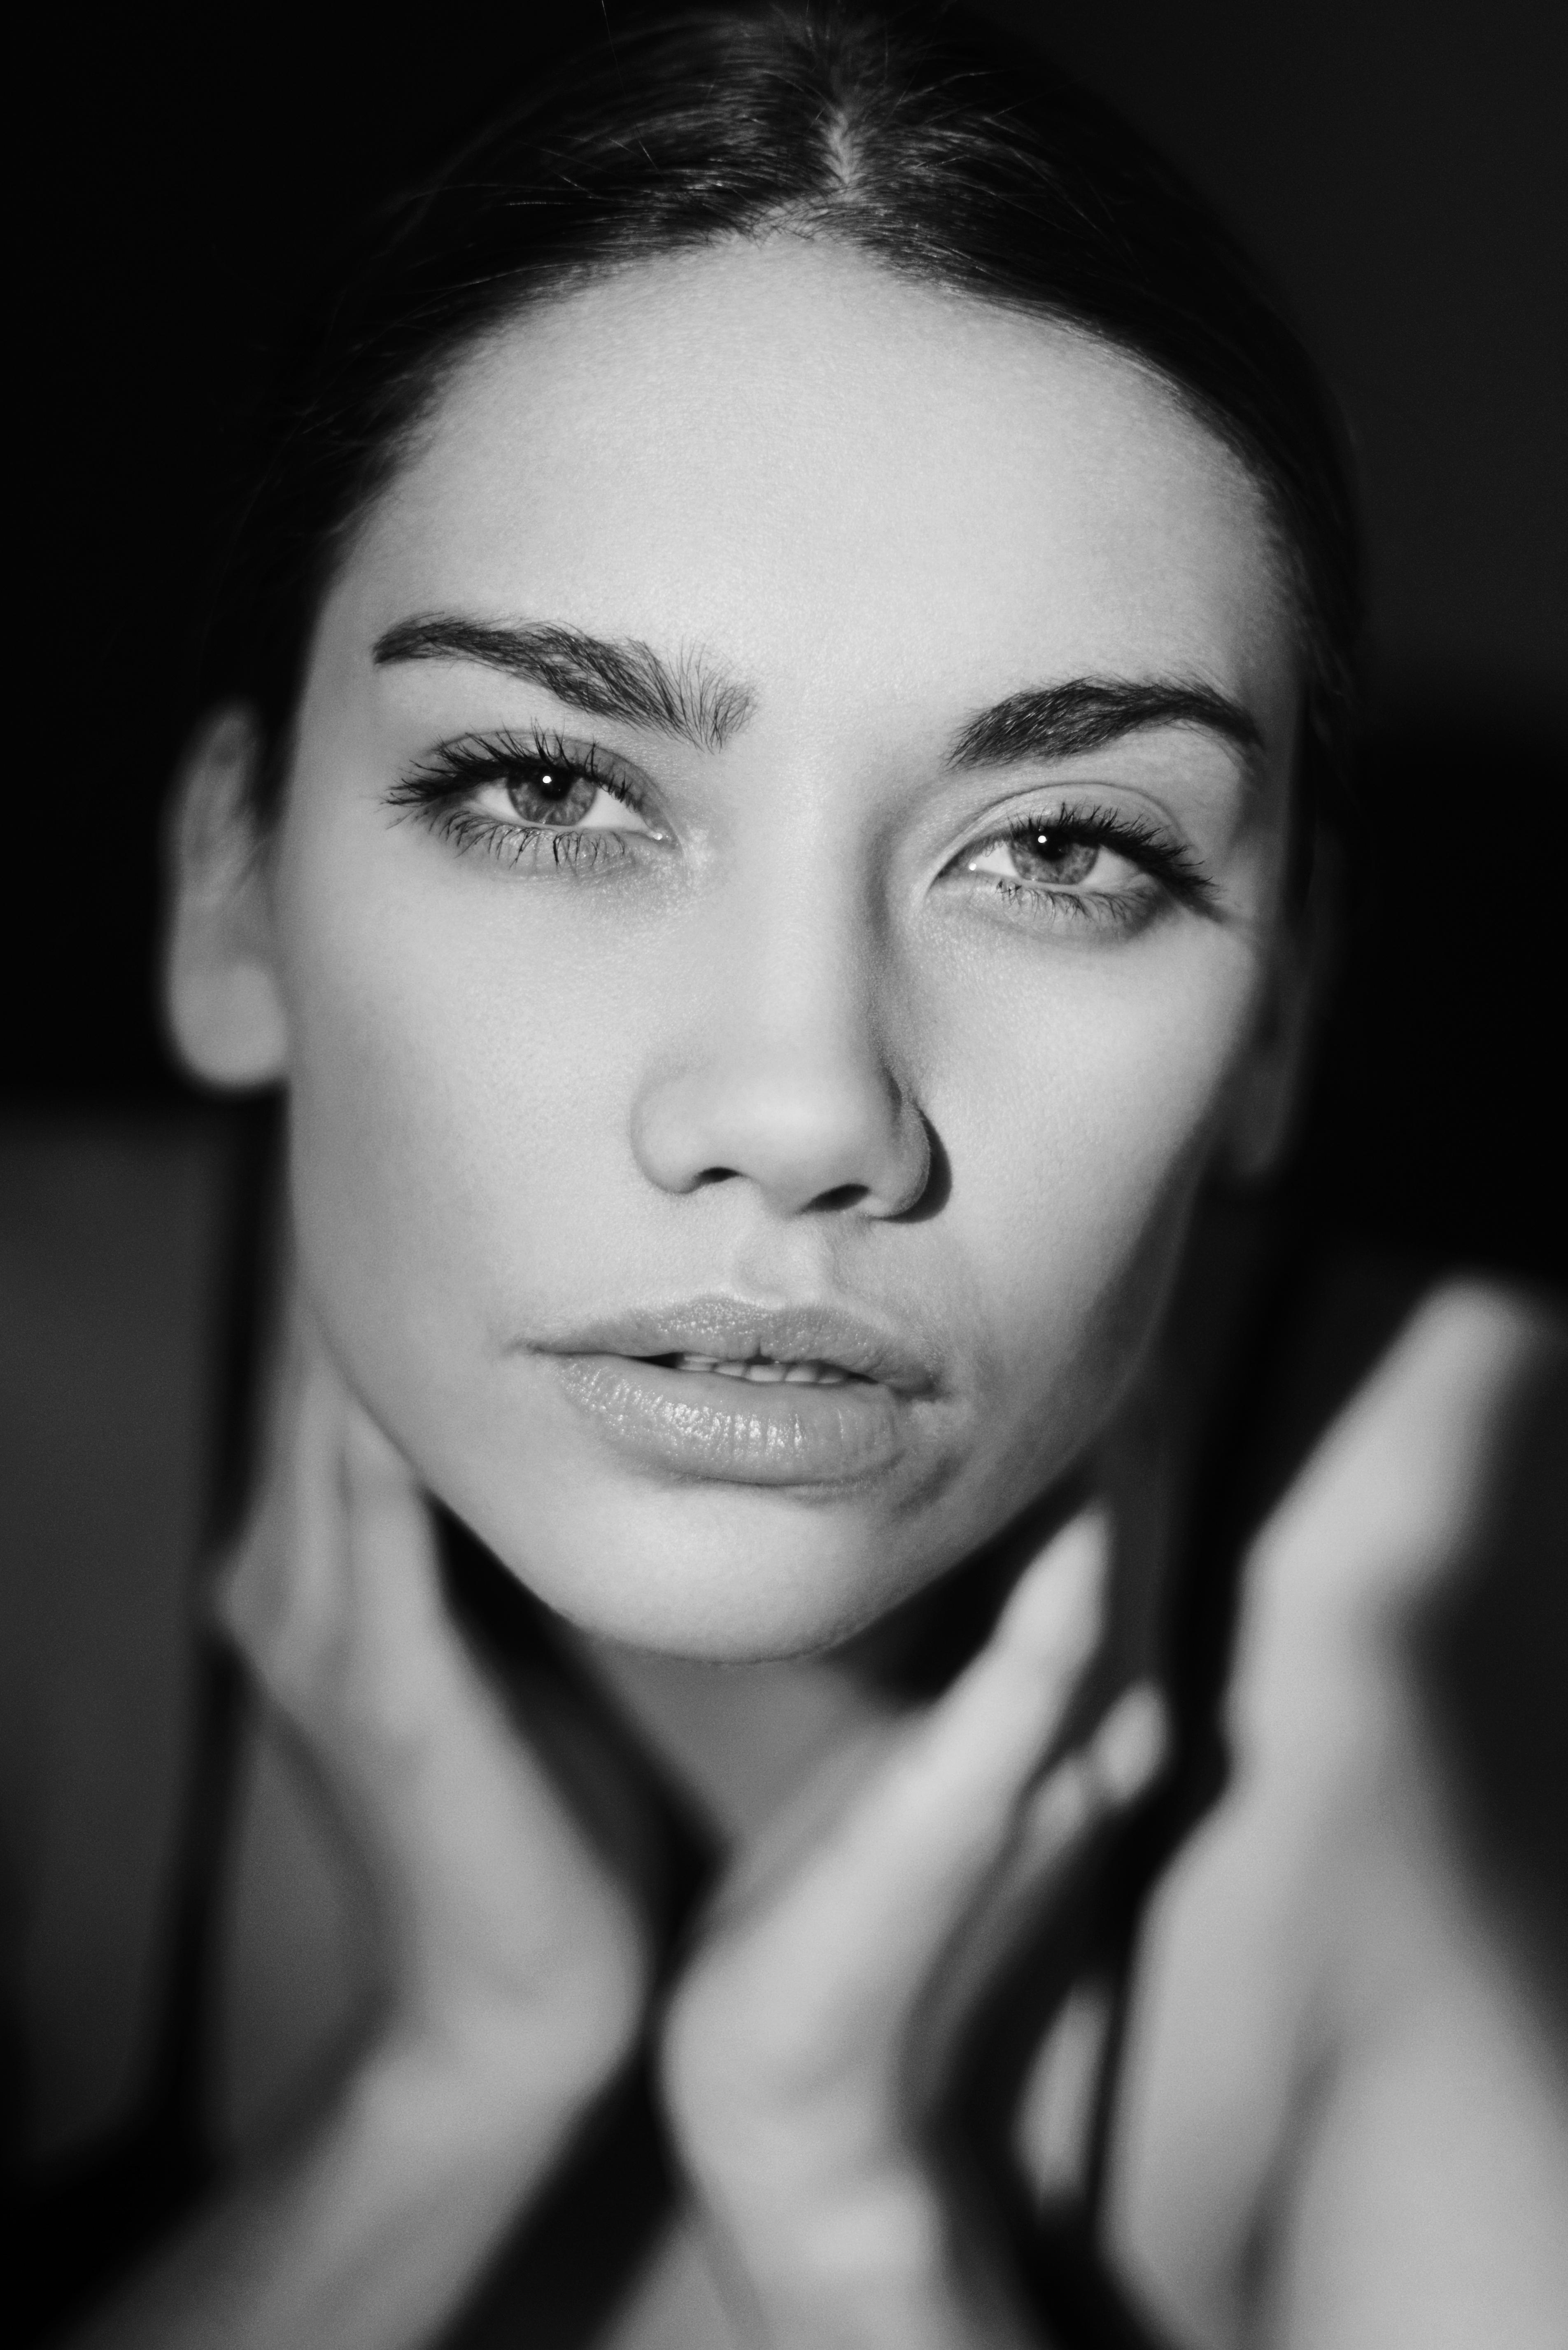 Veronika Belyaeva